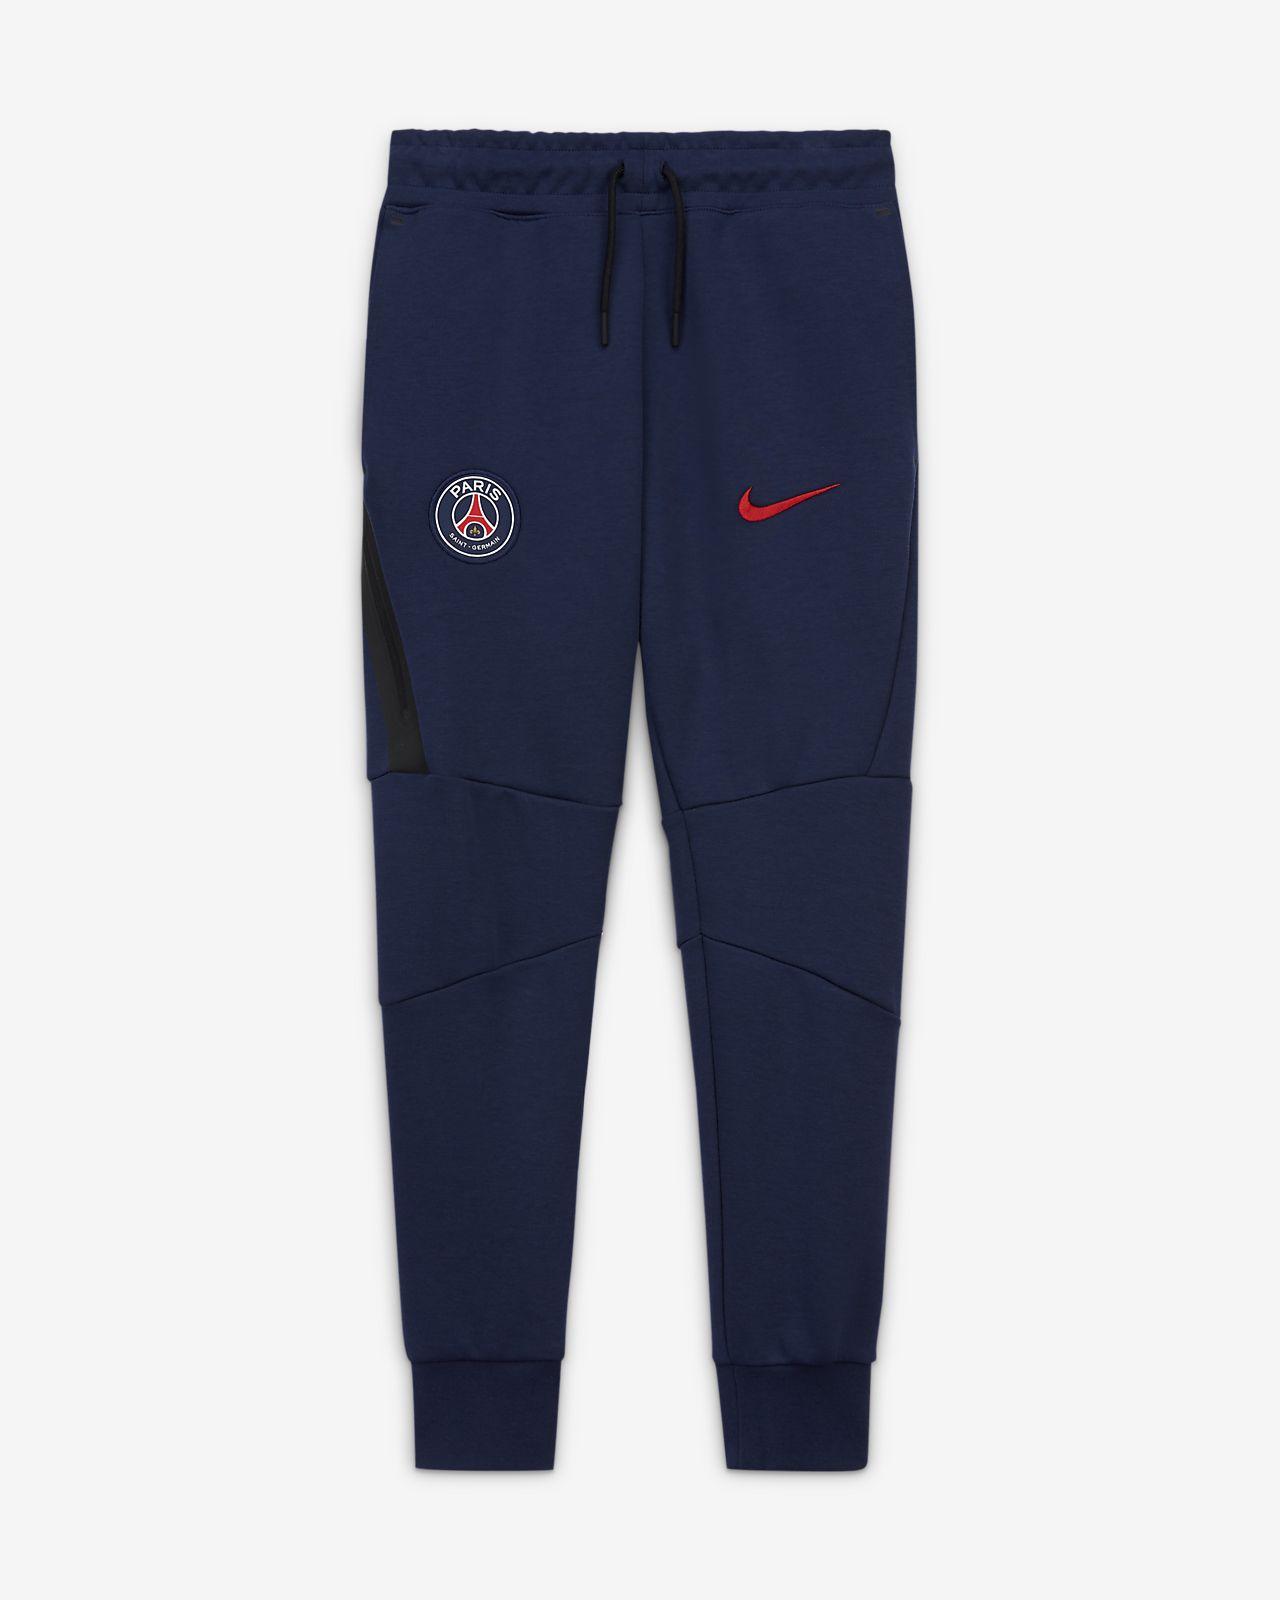 Paris Saint-Germain Older Kids' Fleece Pants